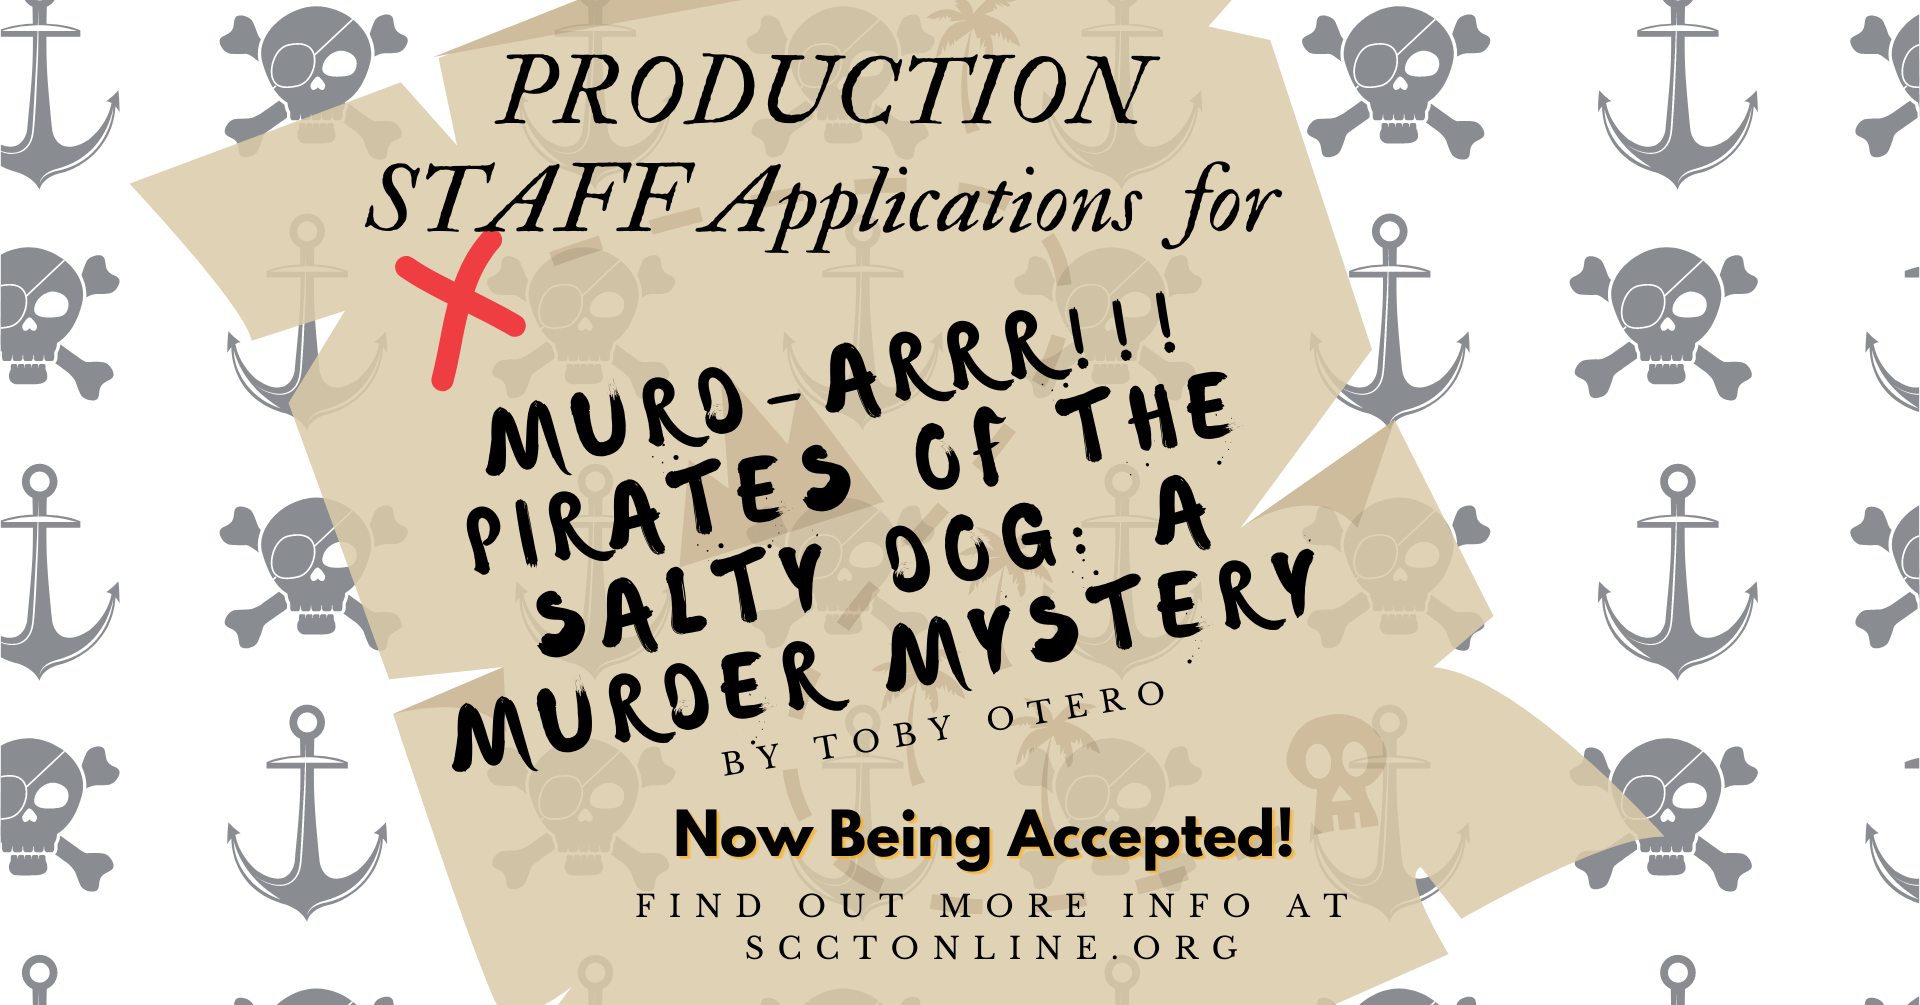 MURD-ARRR!!! Ads